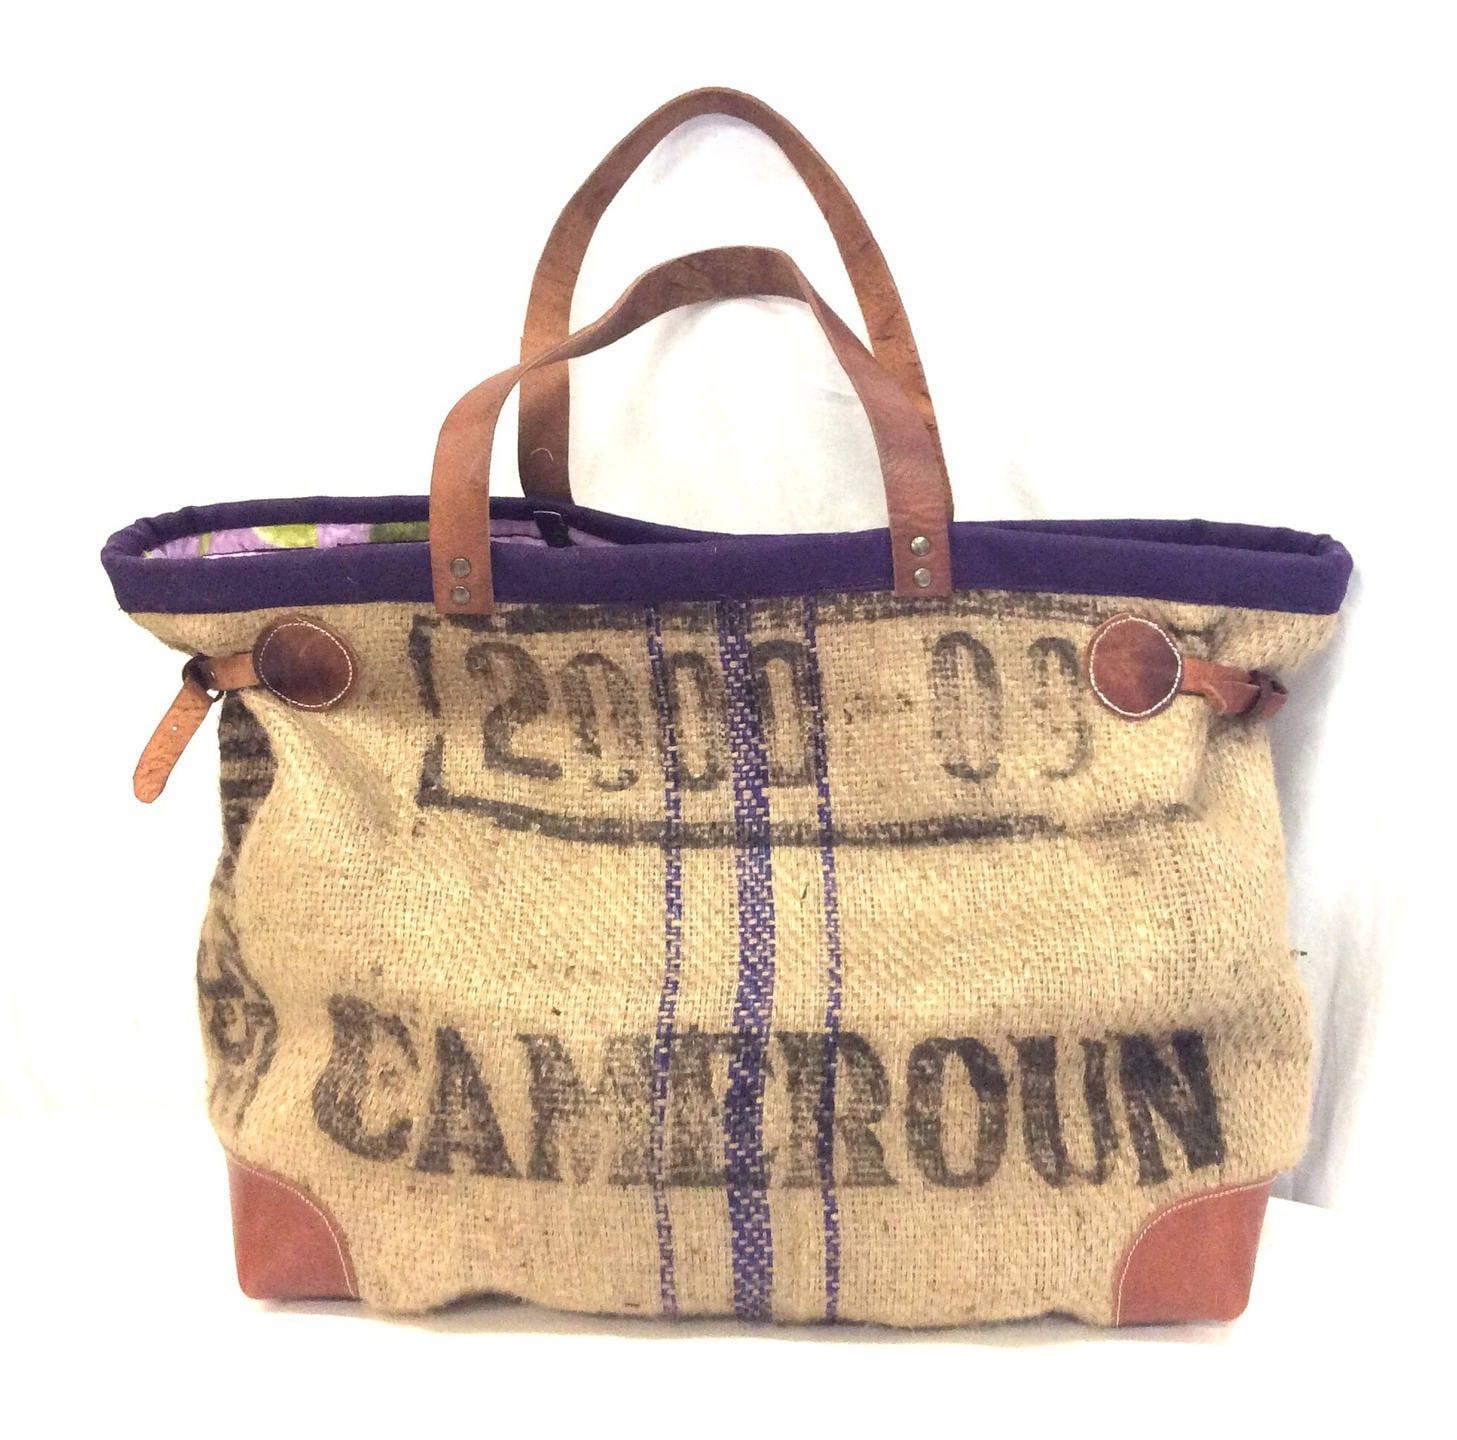 sac cabas toile de jute recycl e violet cuir. Black Bedroom Furniture Sets. Home Design Ideas